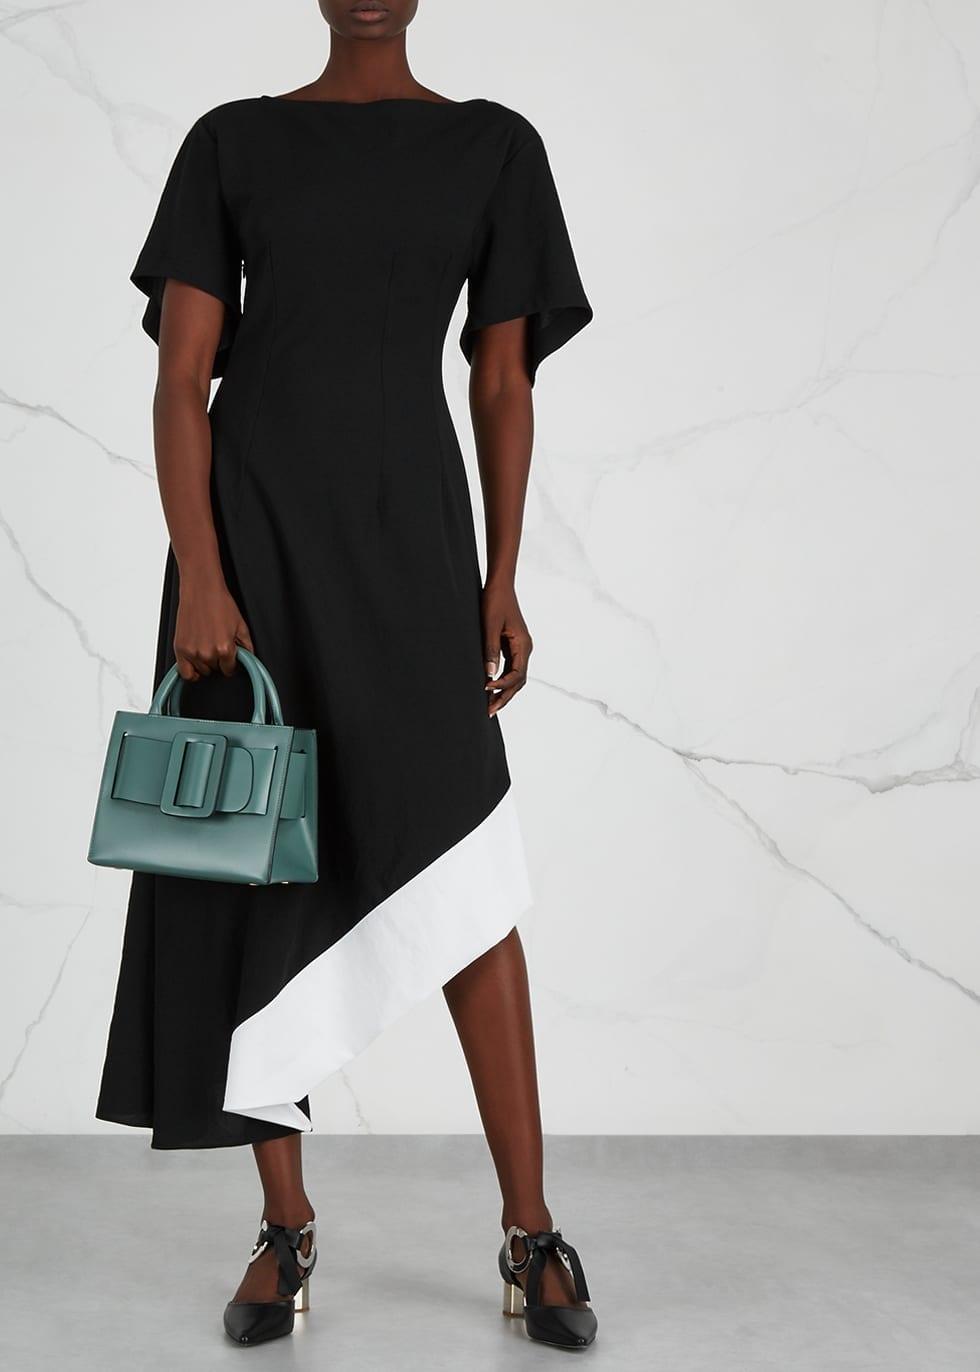 LOEWE Asymmetric Midi Black Dress